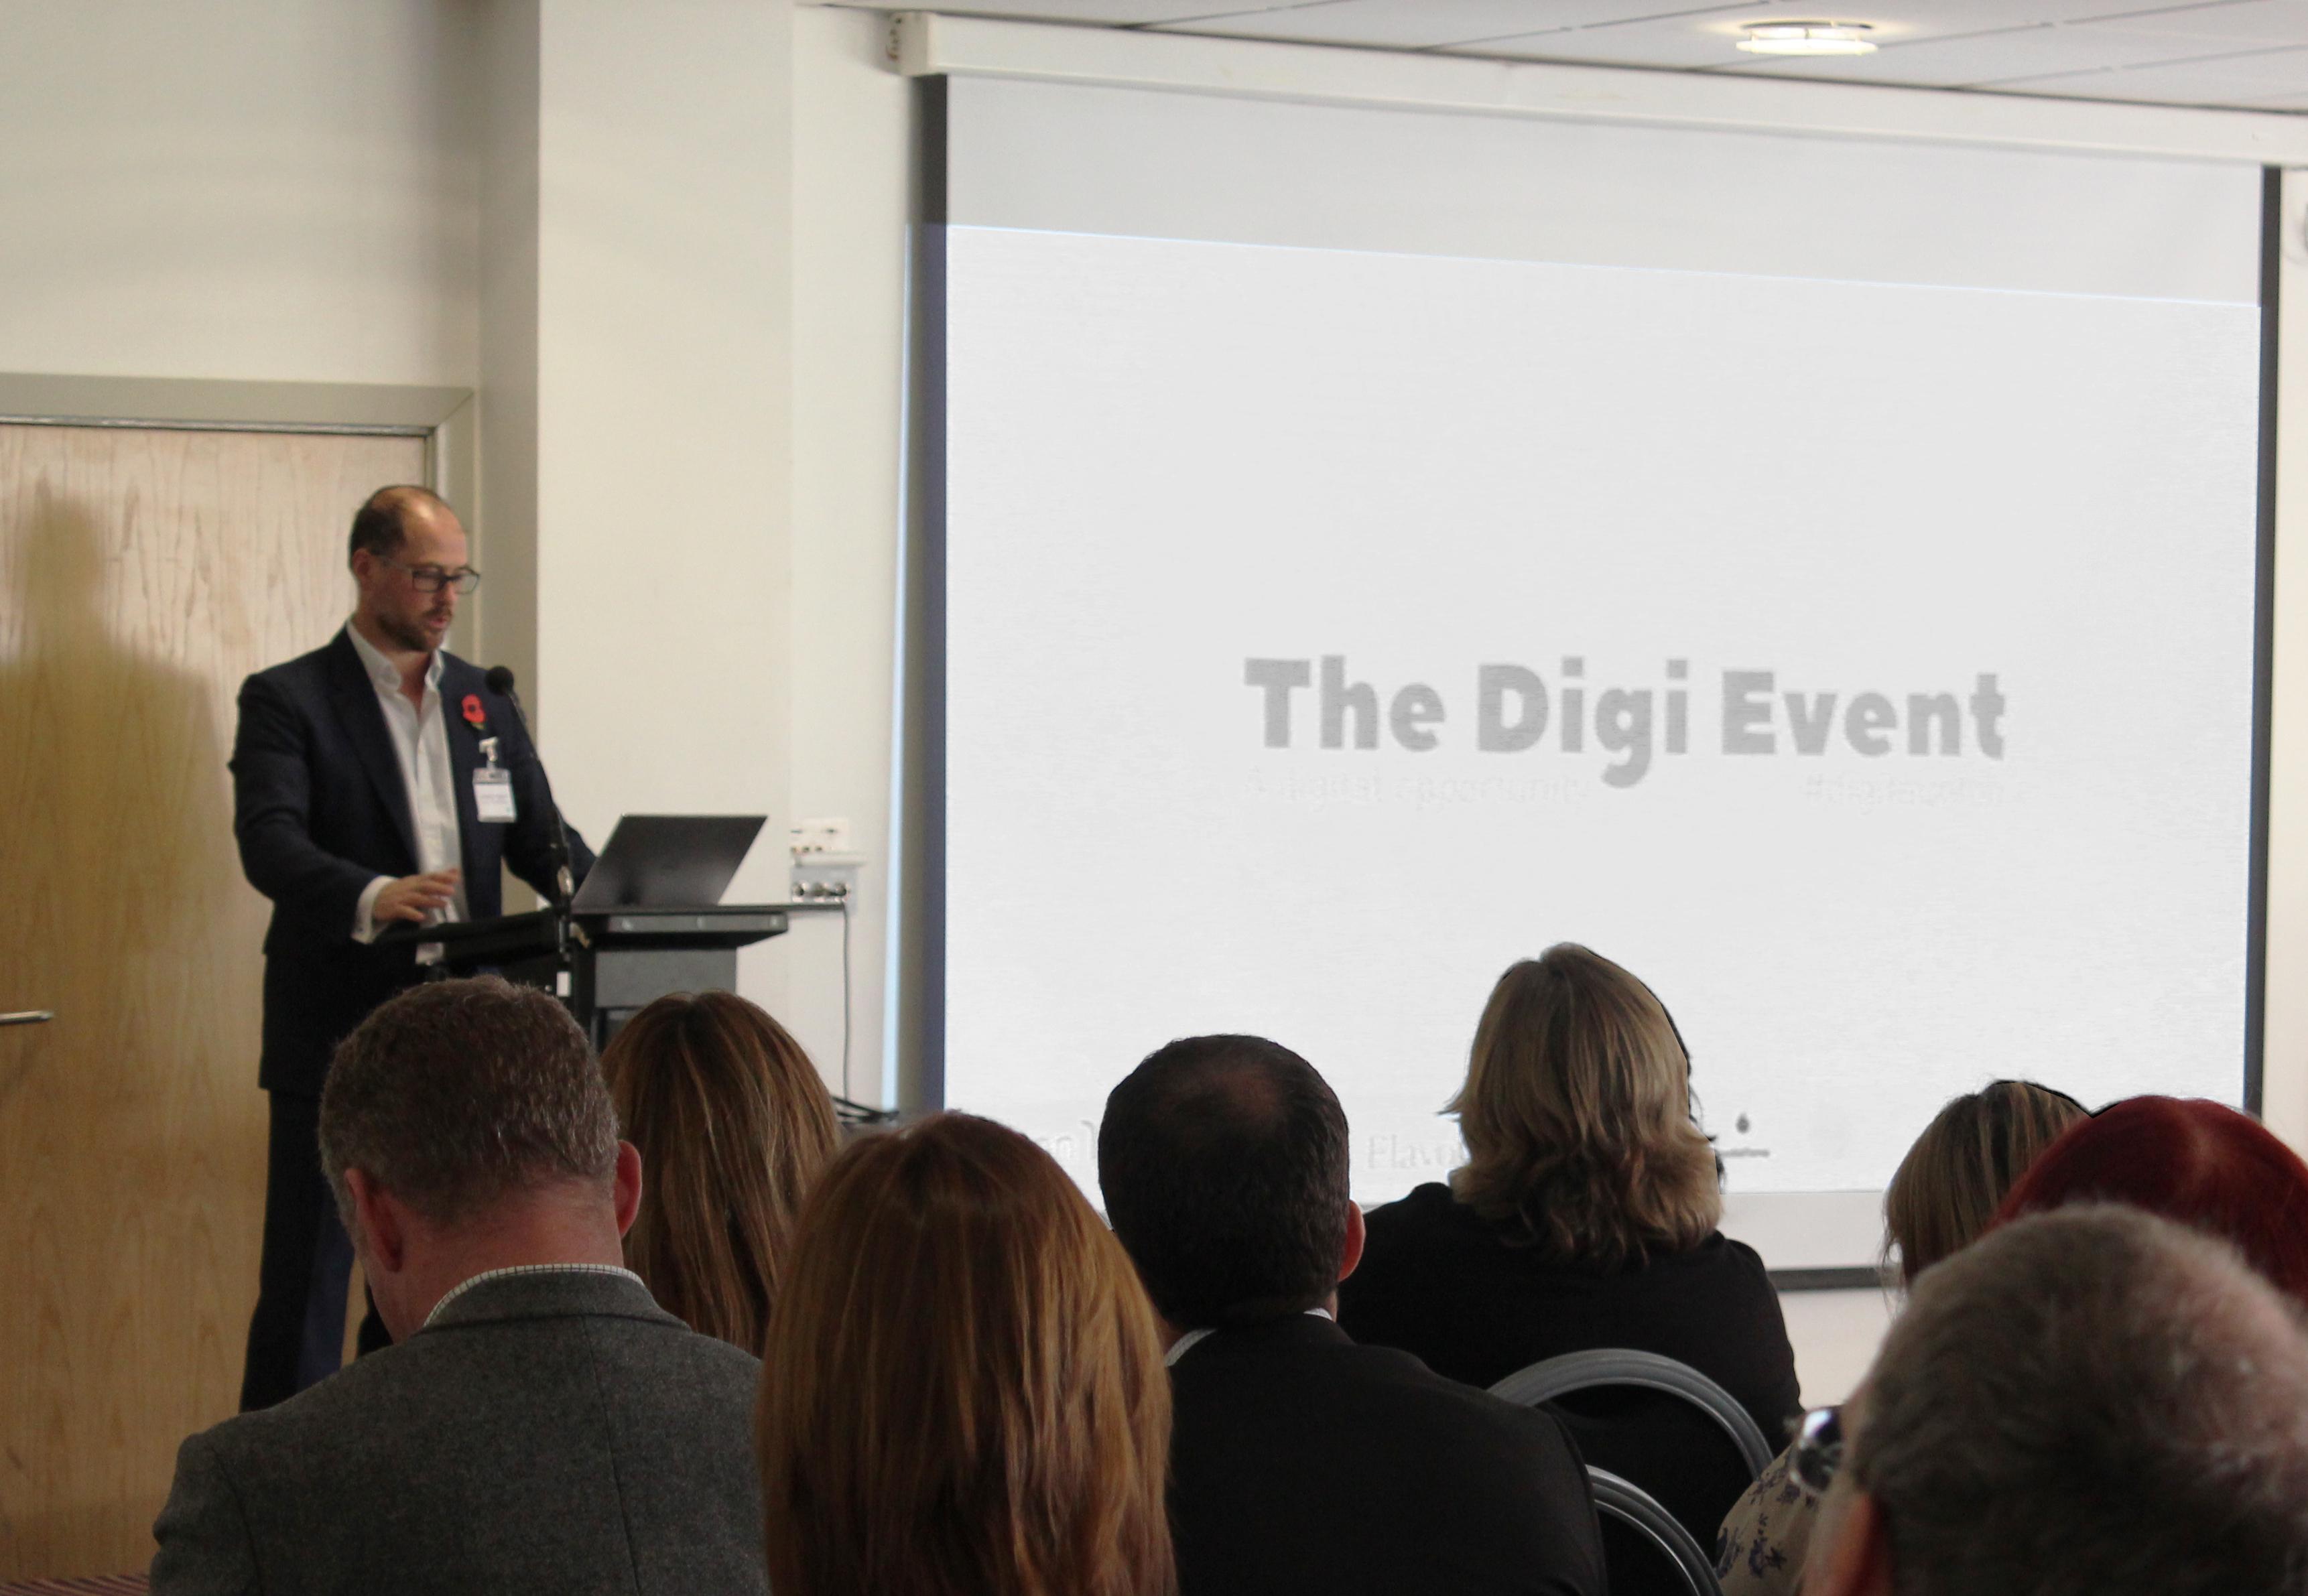 Jeremy Hyams chairing The Digi Event